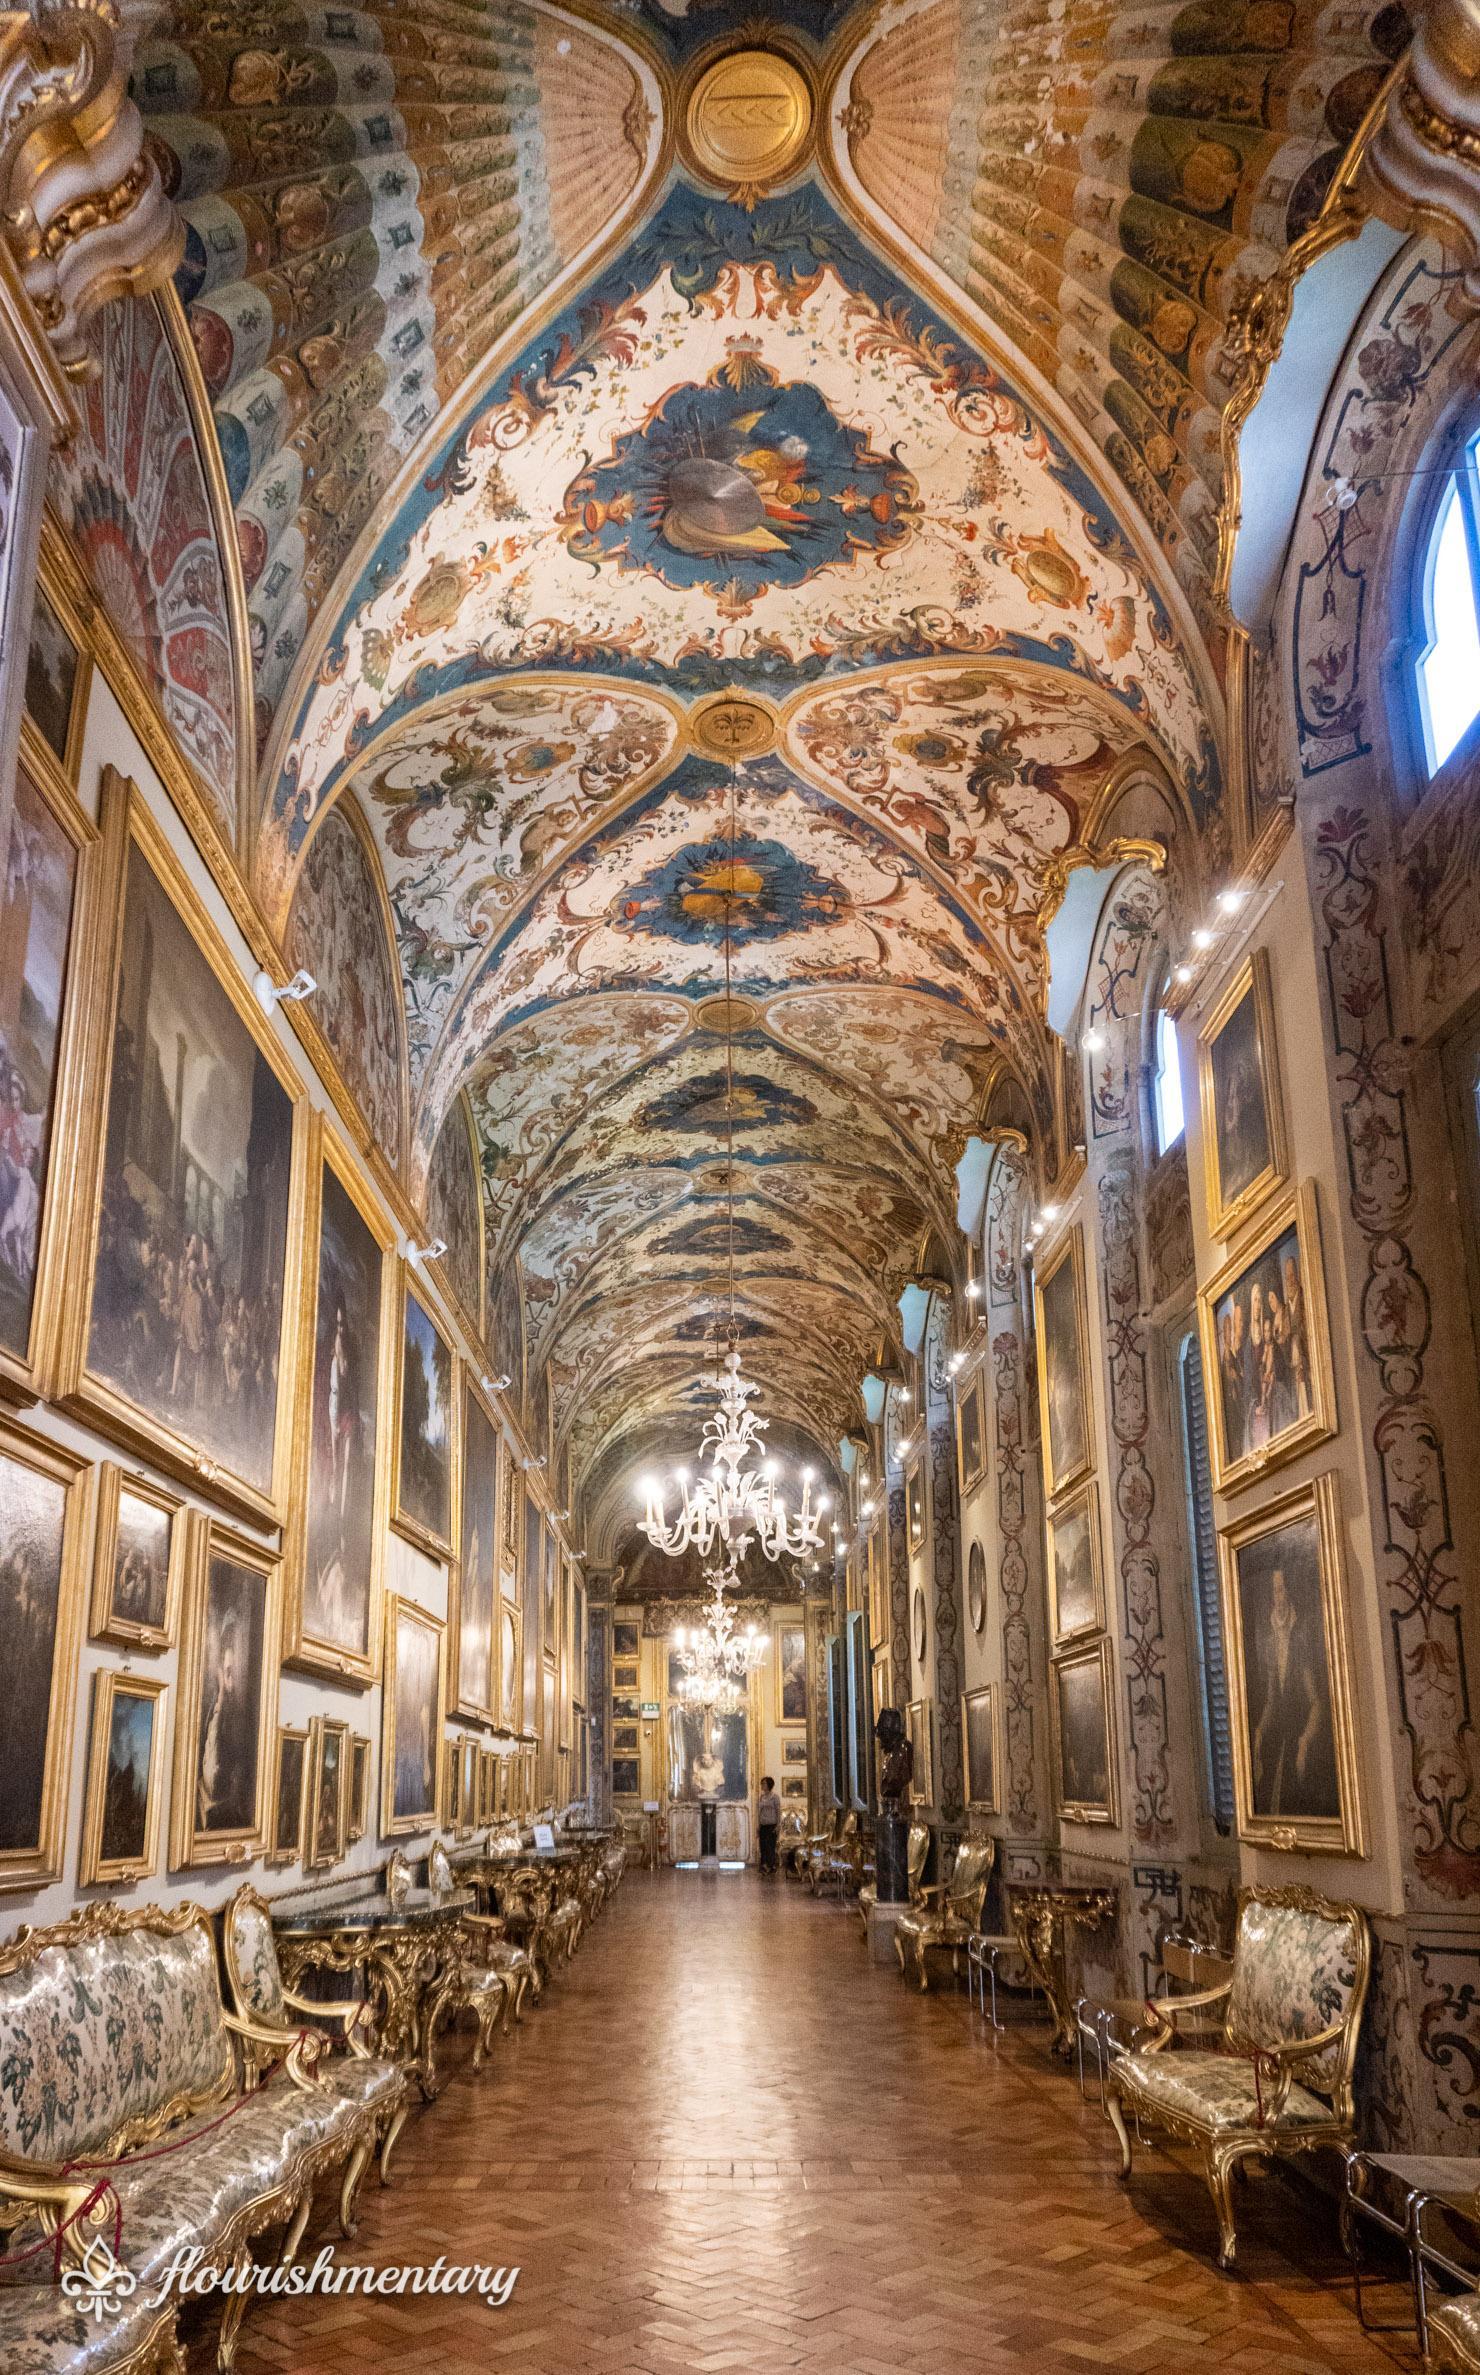 Galleria Doria Pamphilj fresco and art wing